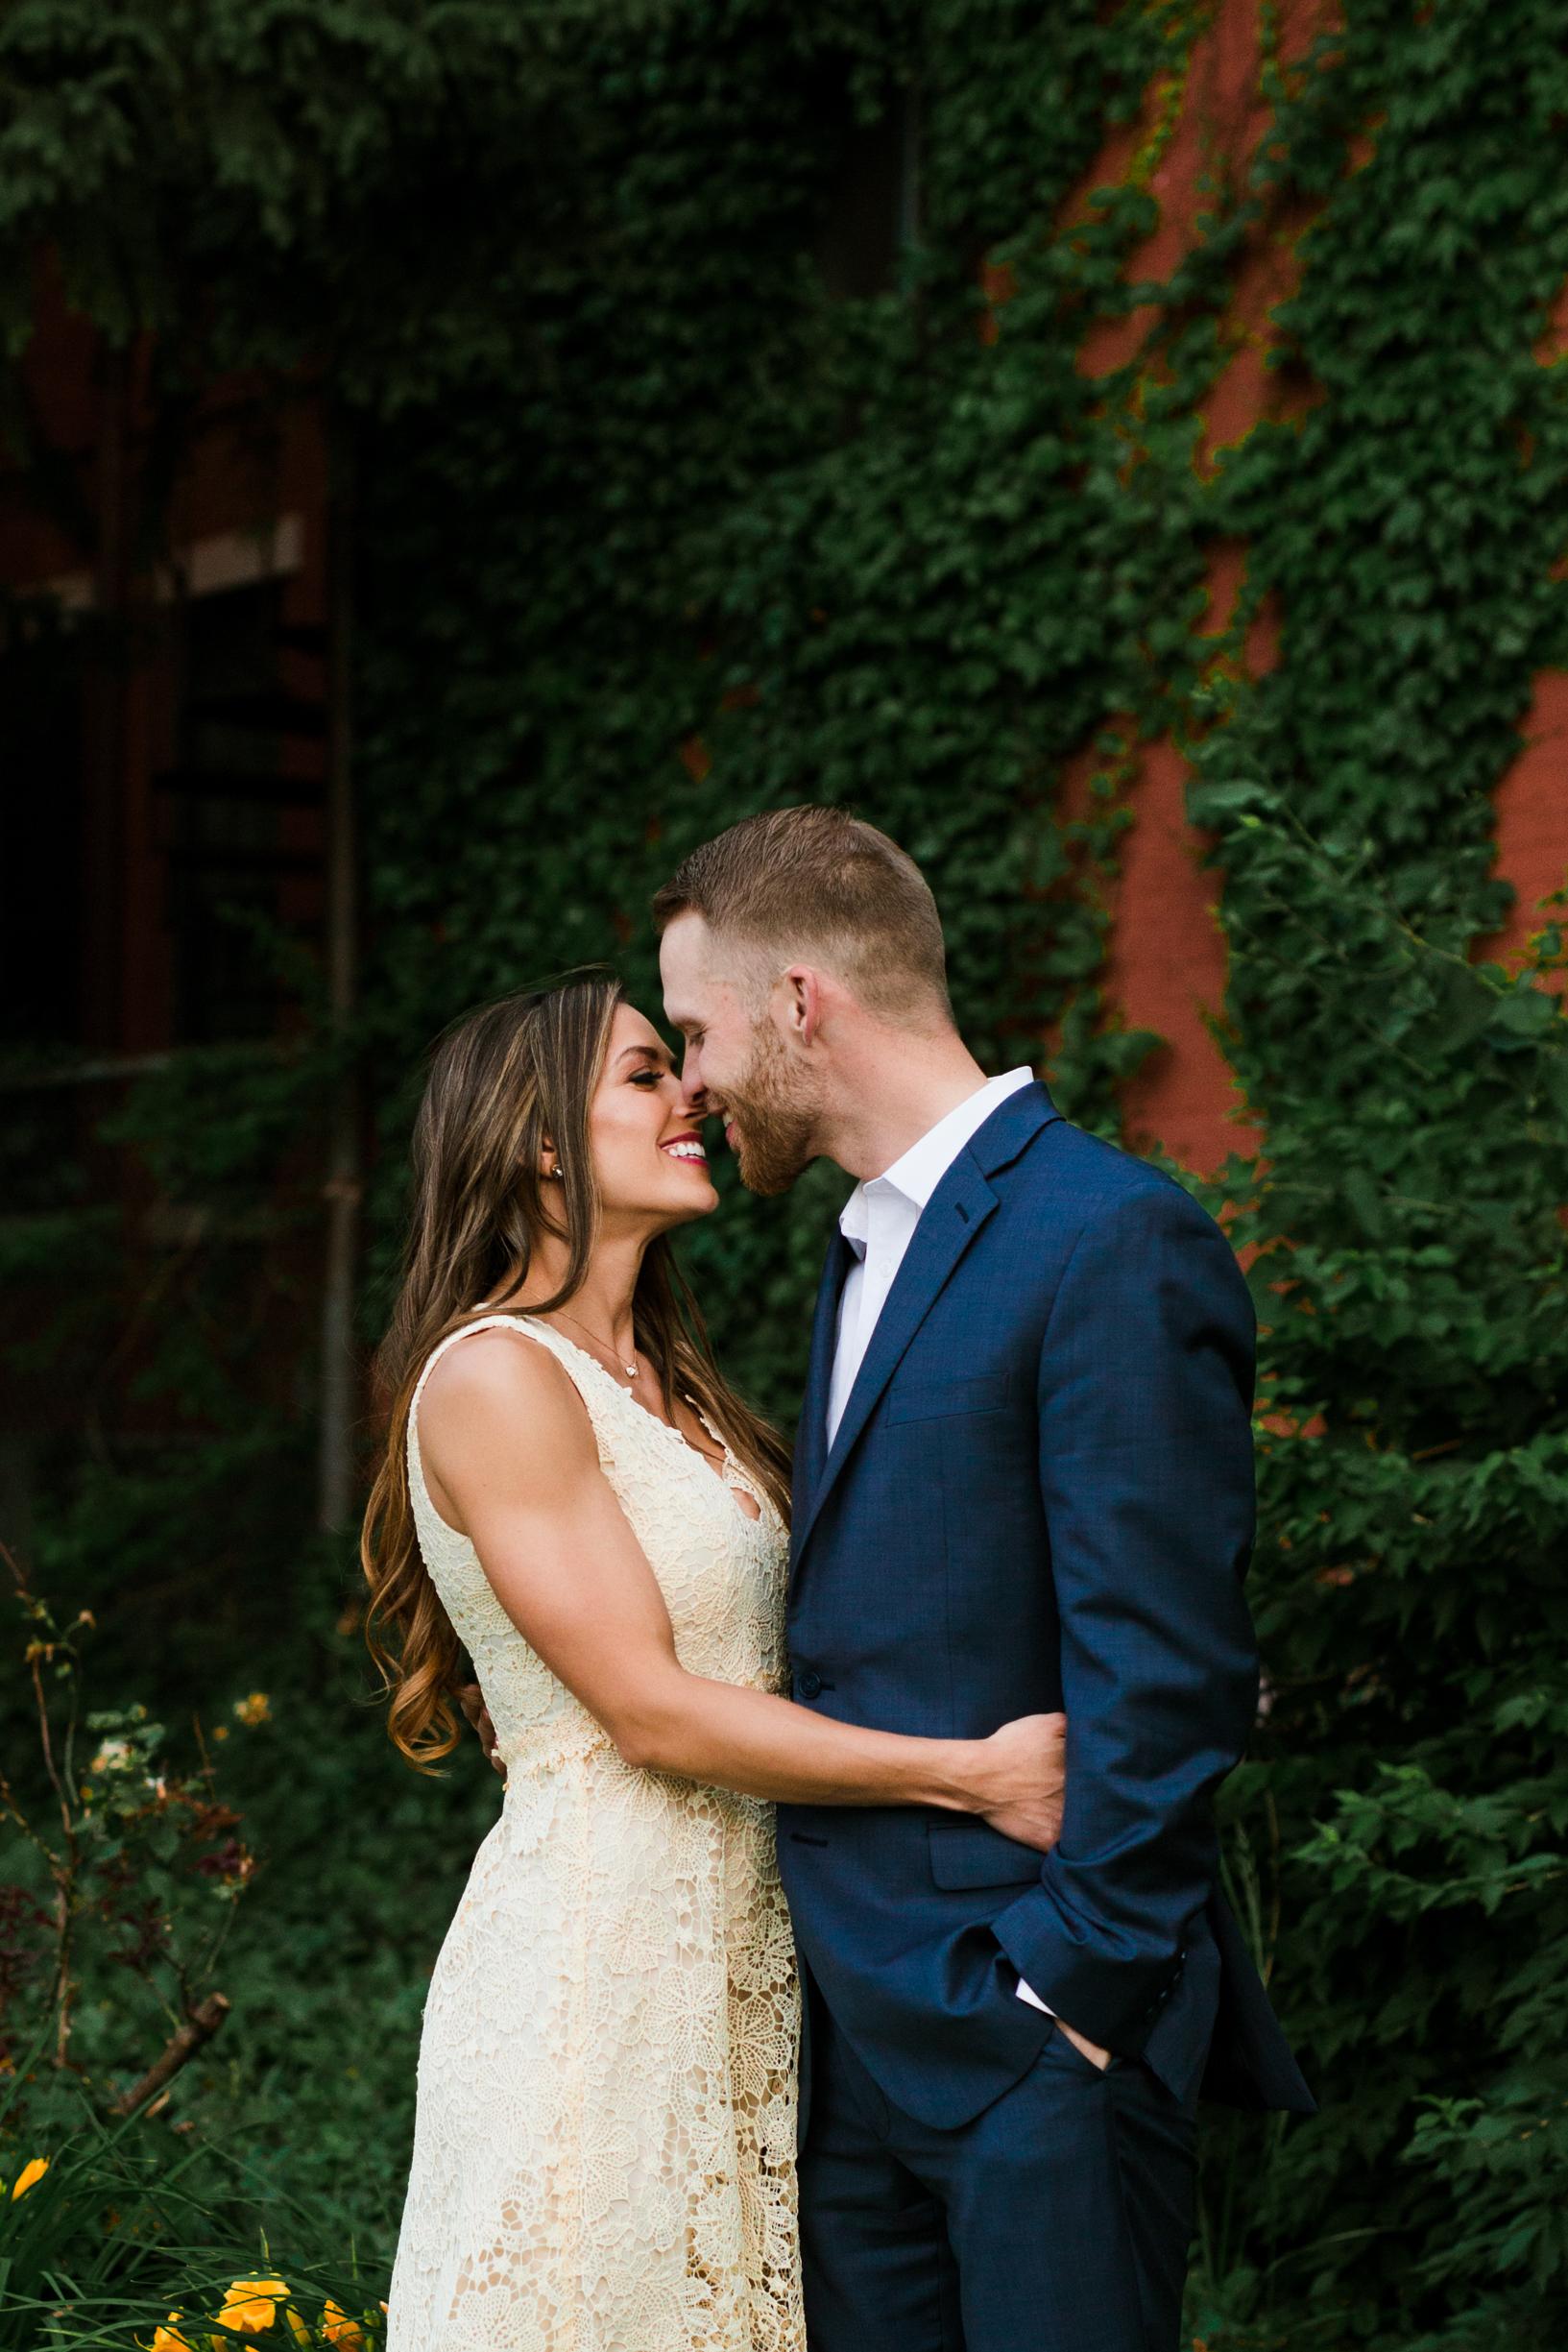 Victoria & Chad Engagement 2018 Crystal Ludwick Photo Louisville Kentucky Wedding Photographer WEBSITE (33 of 48).jpg